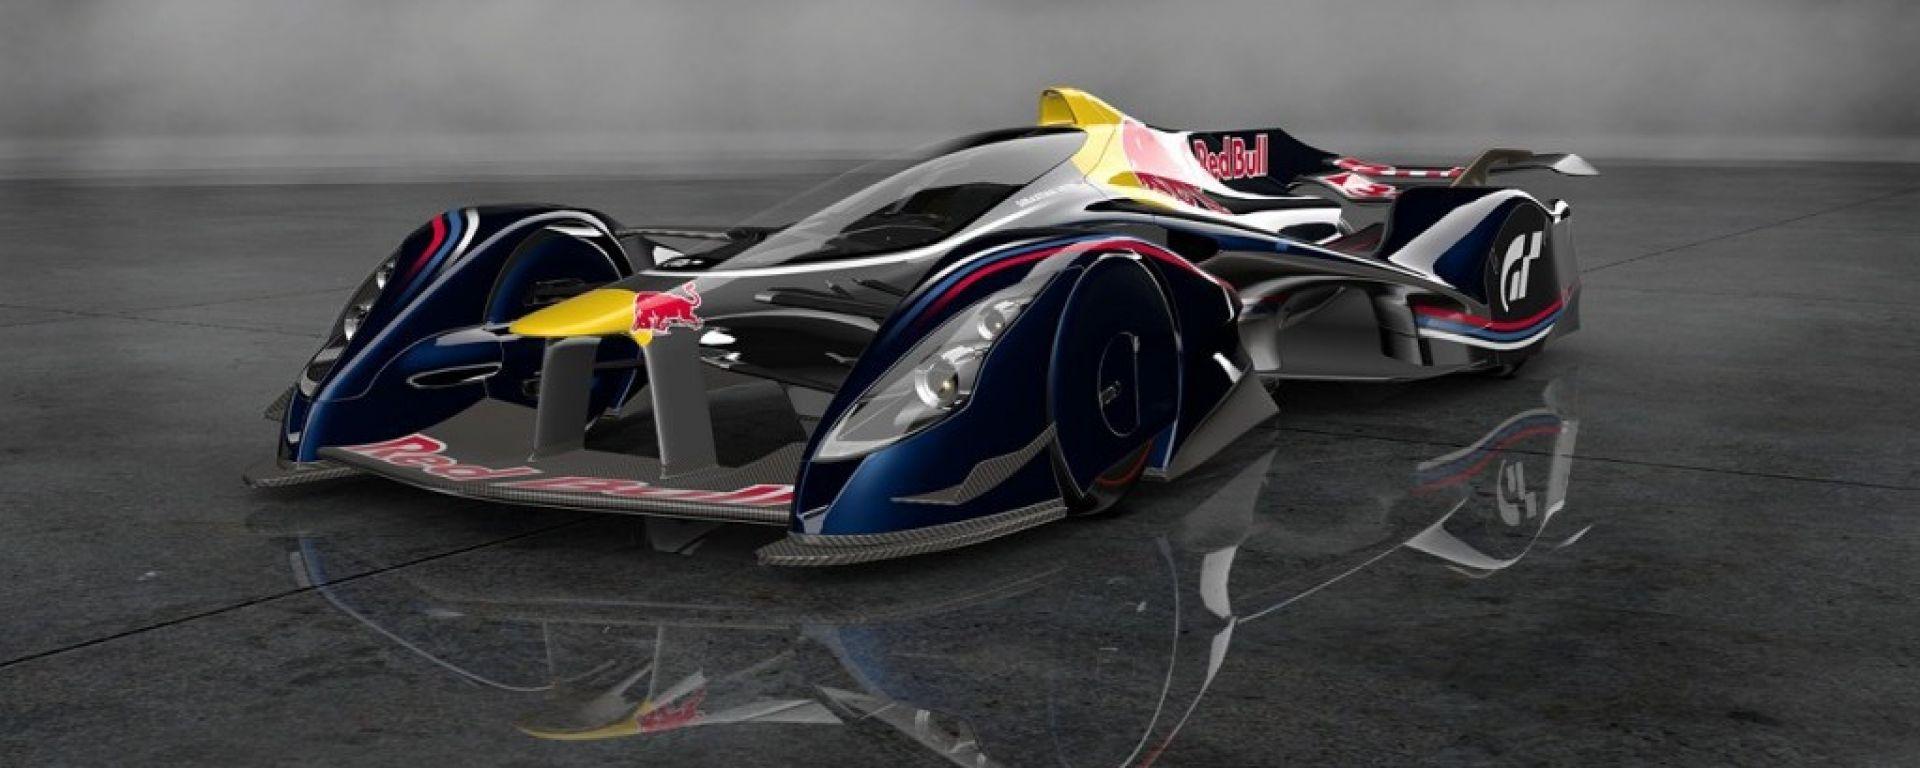 Red Bull Racing X2014: la concept da Formula 1 disegnata da Adrian Newey